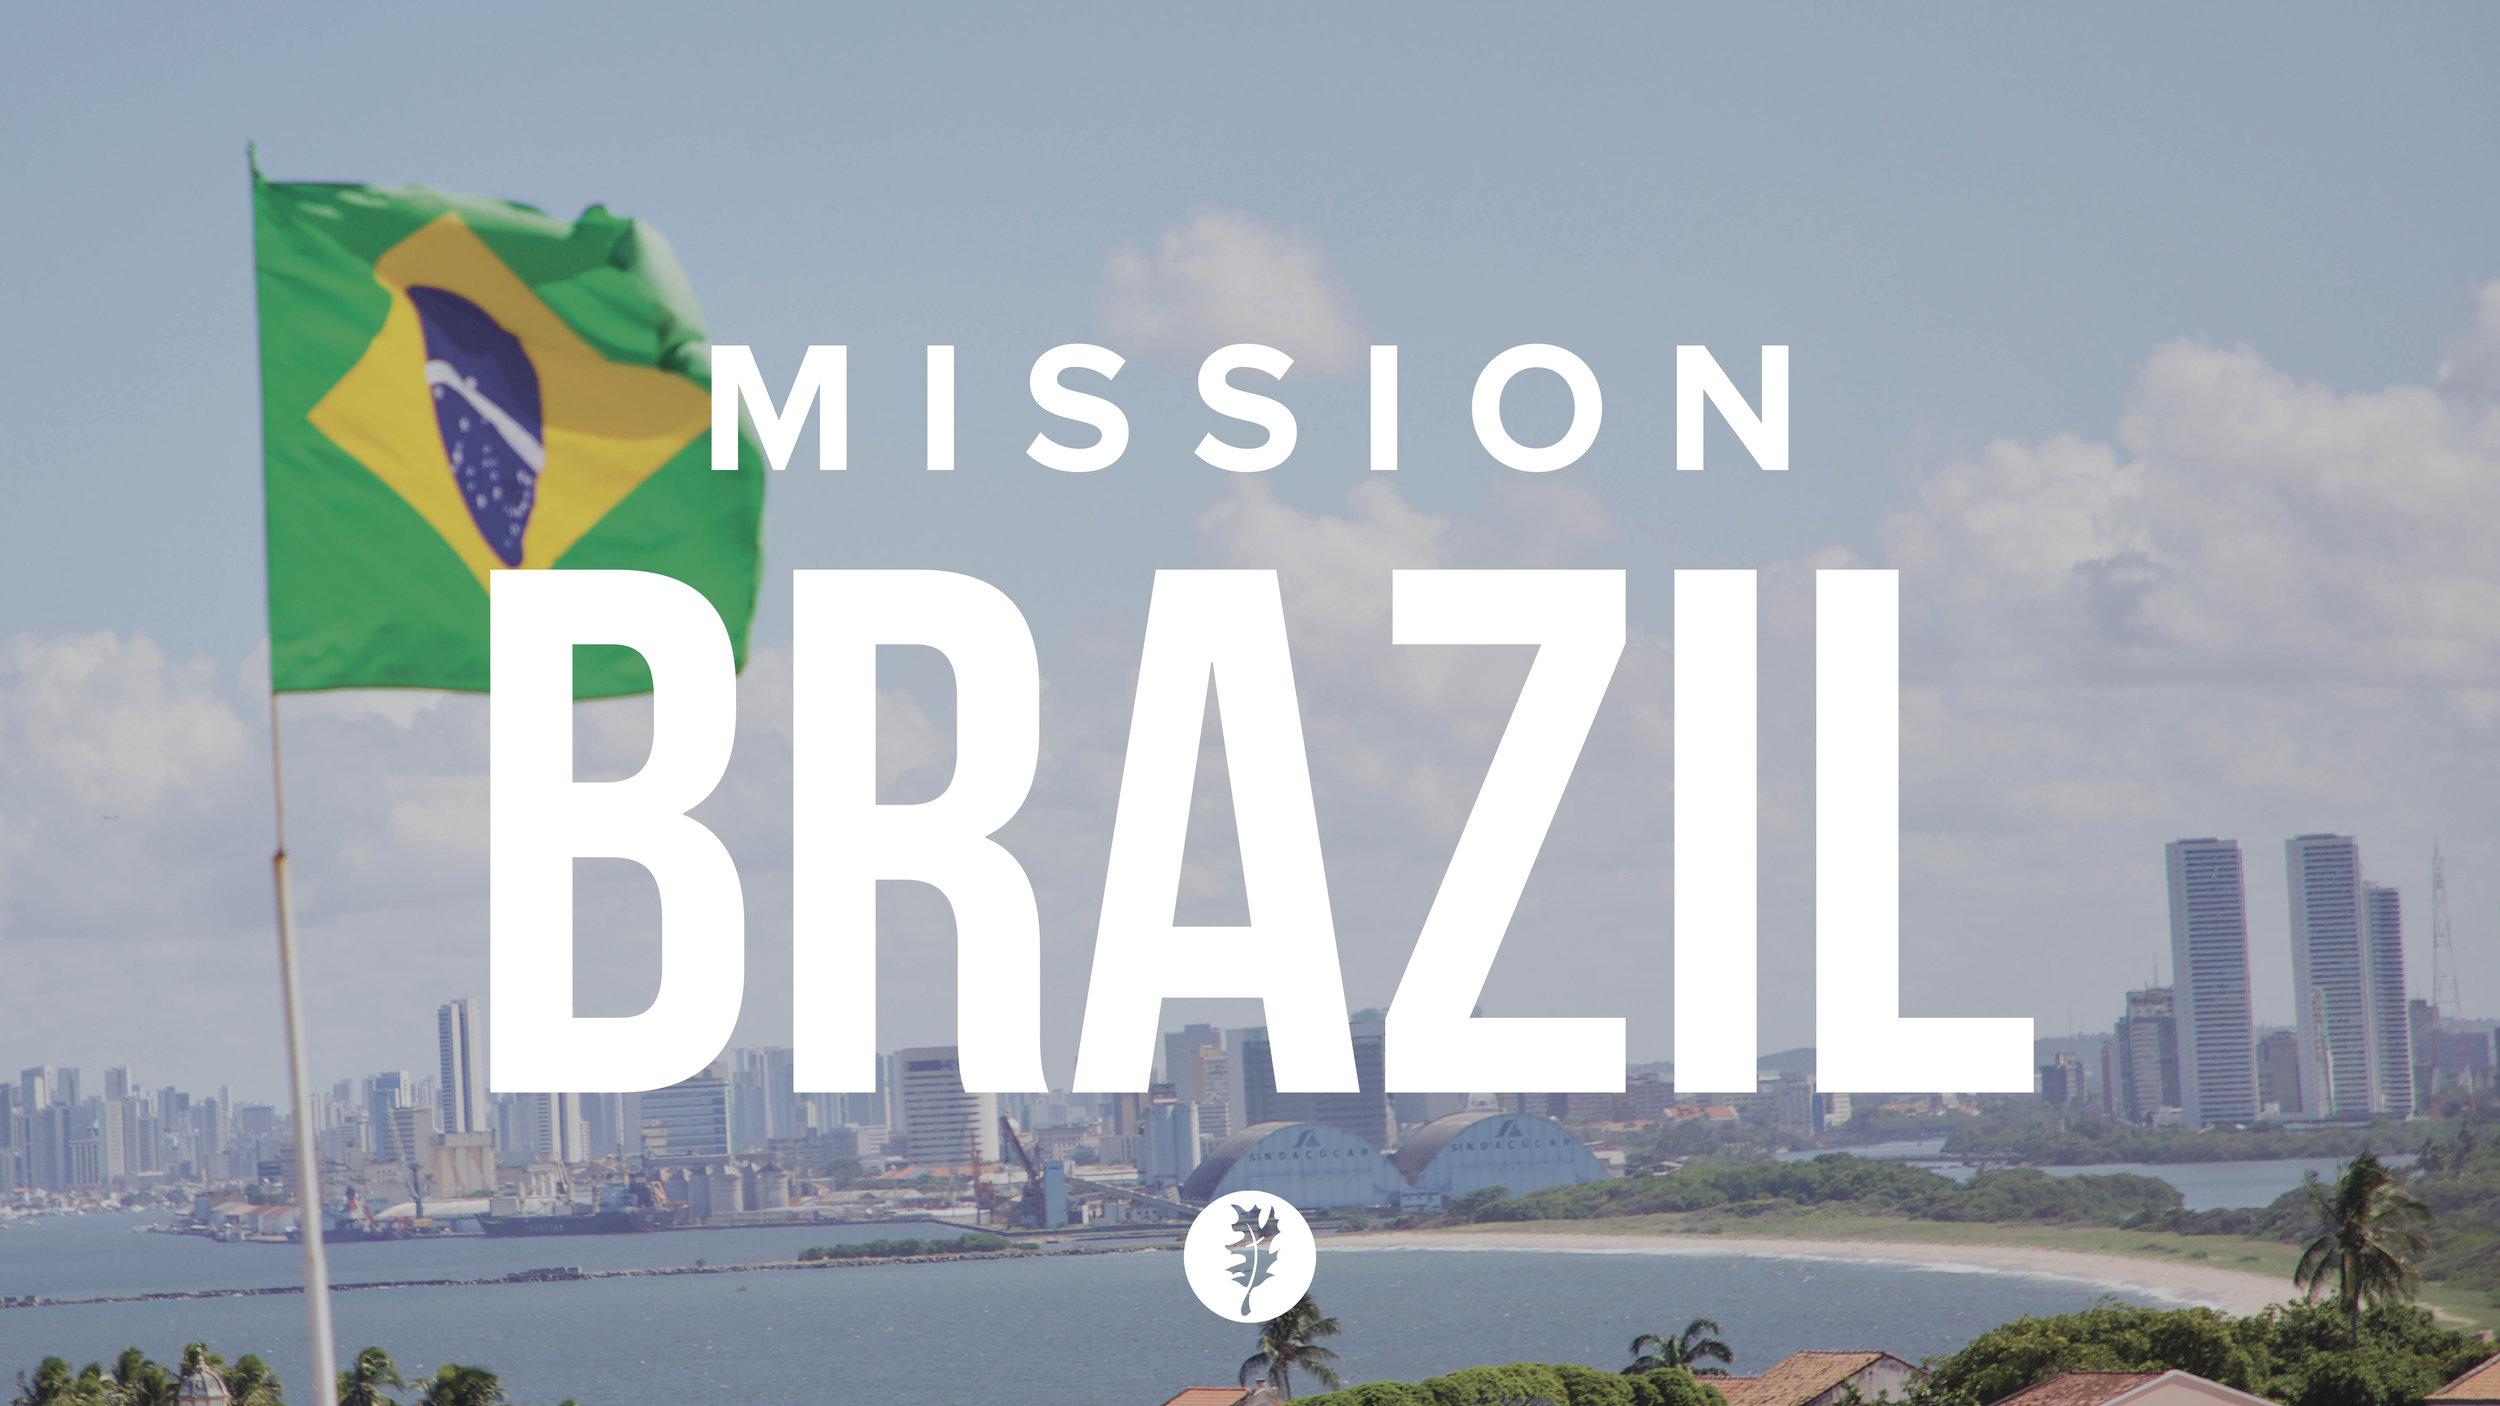 Mission Brazil.jpg